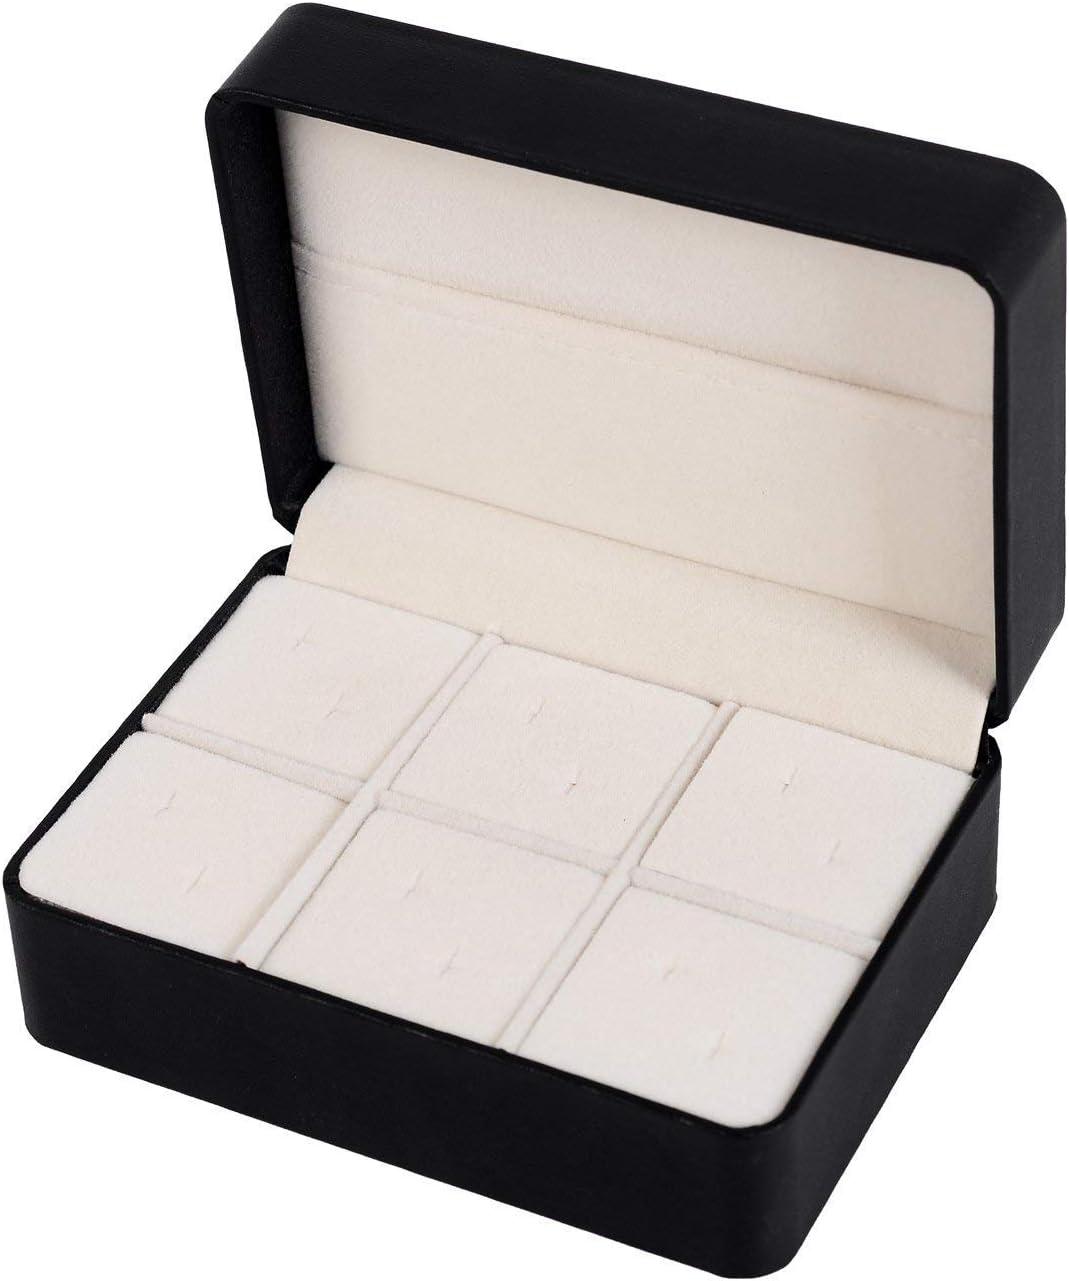 Salutto PU Box Cufflinks Tie Clip Brooch Lapel Storage Case Box Boutique Black